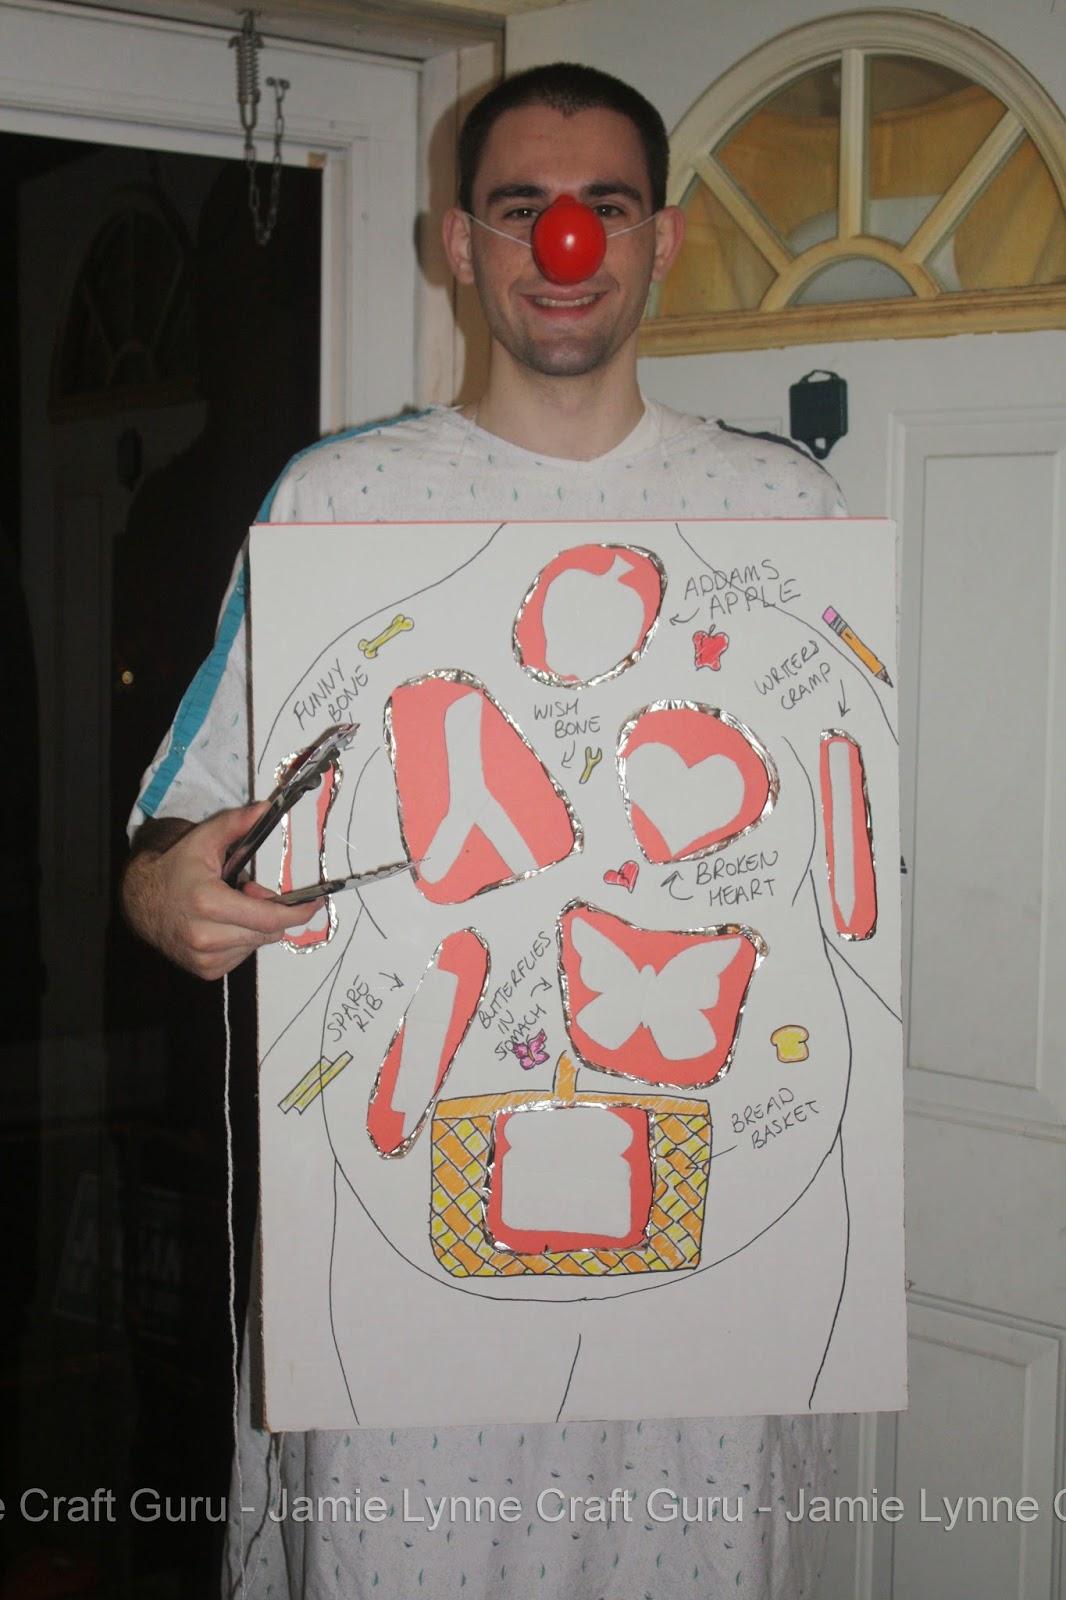 Jamie Lynne Craft Guru Homemade Costumes Operation Man